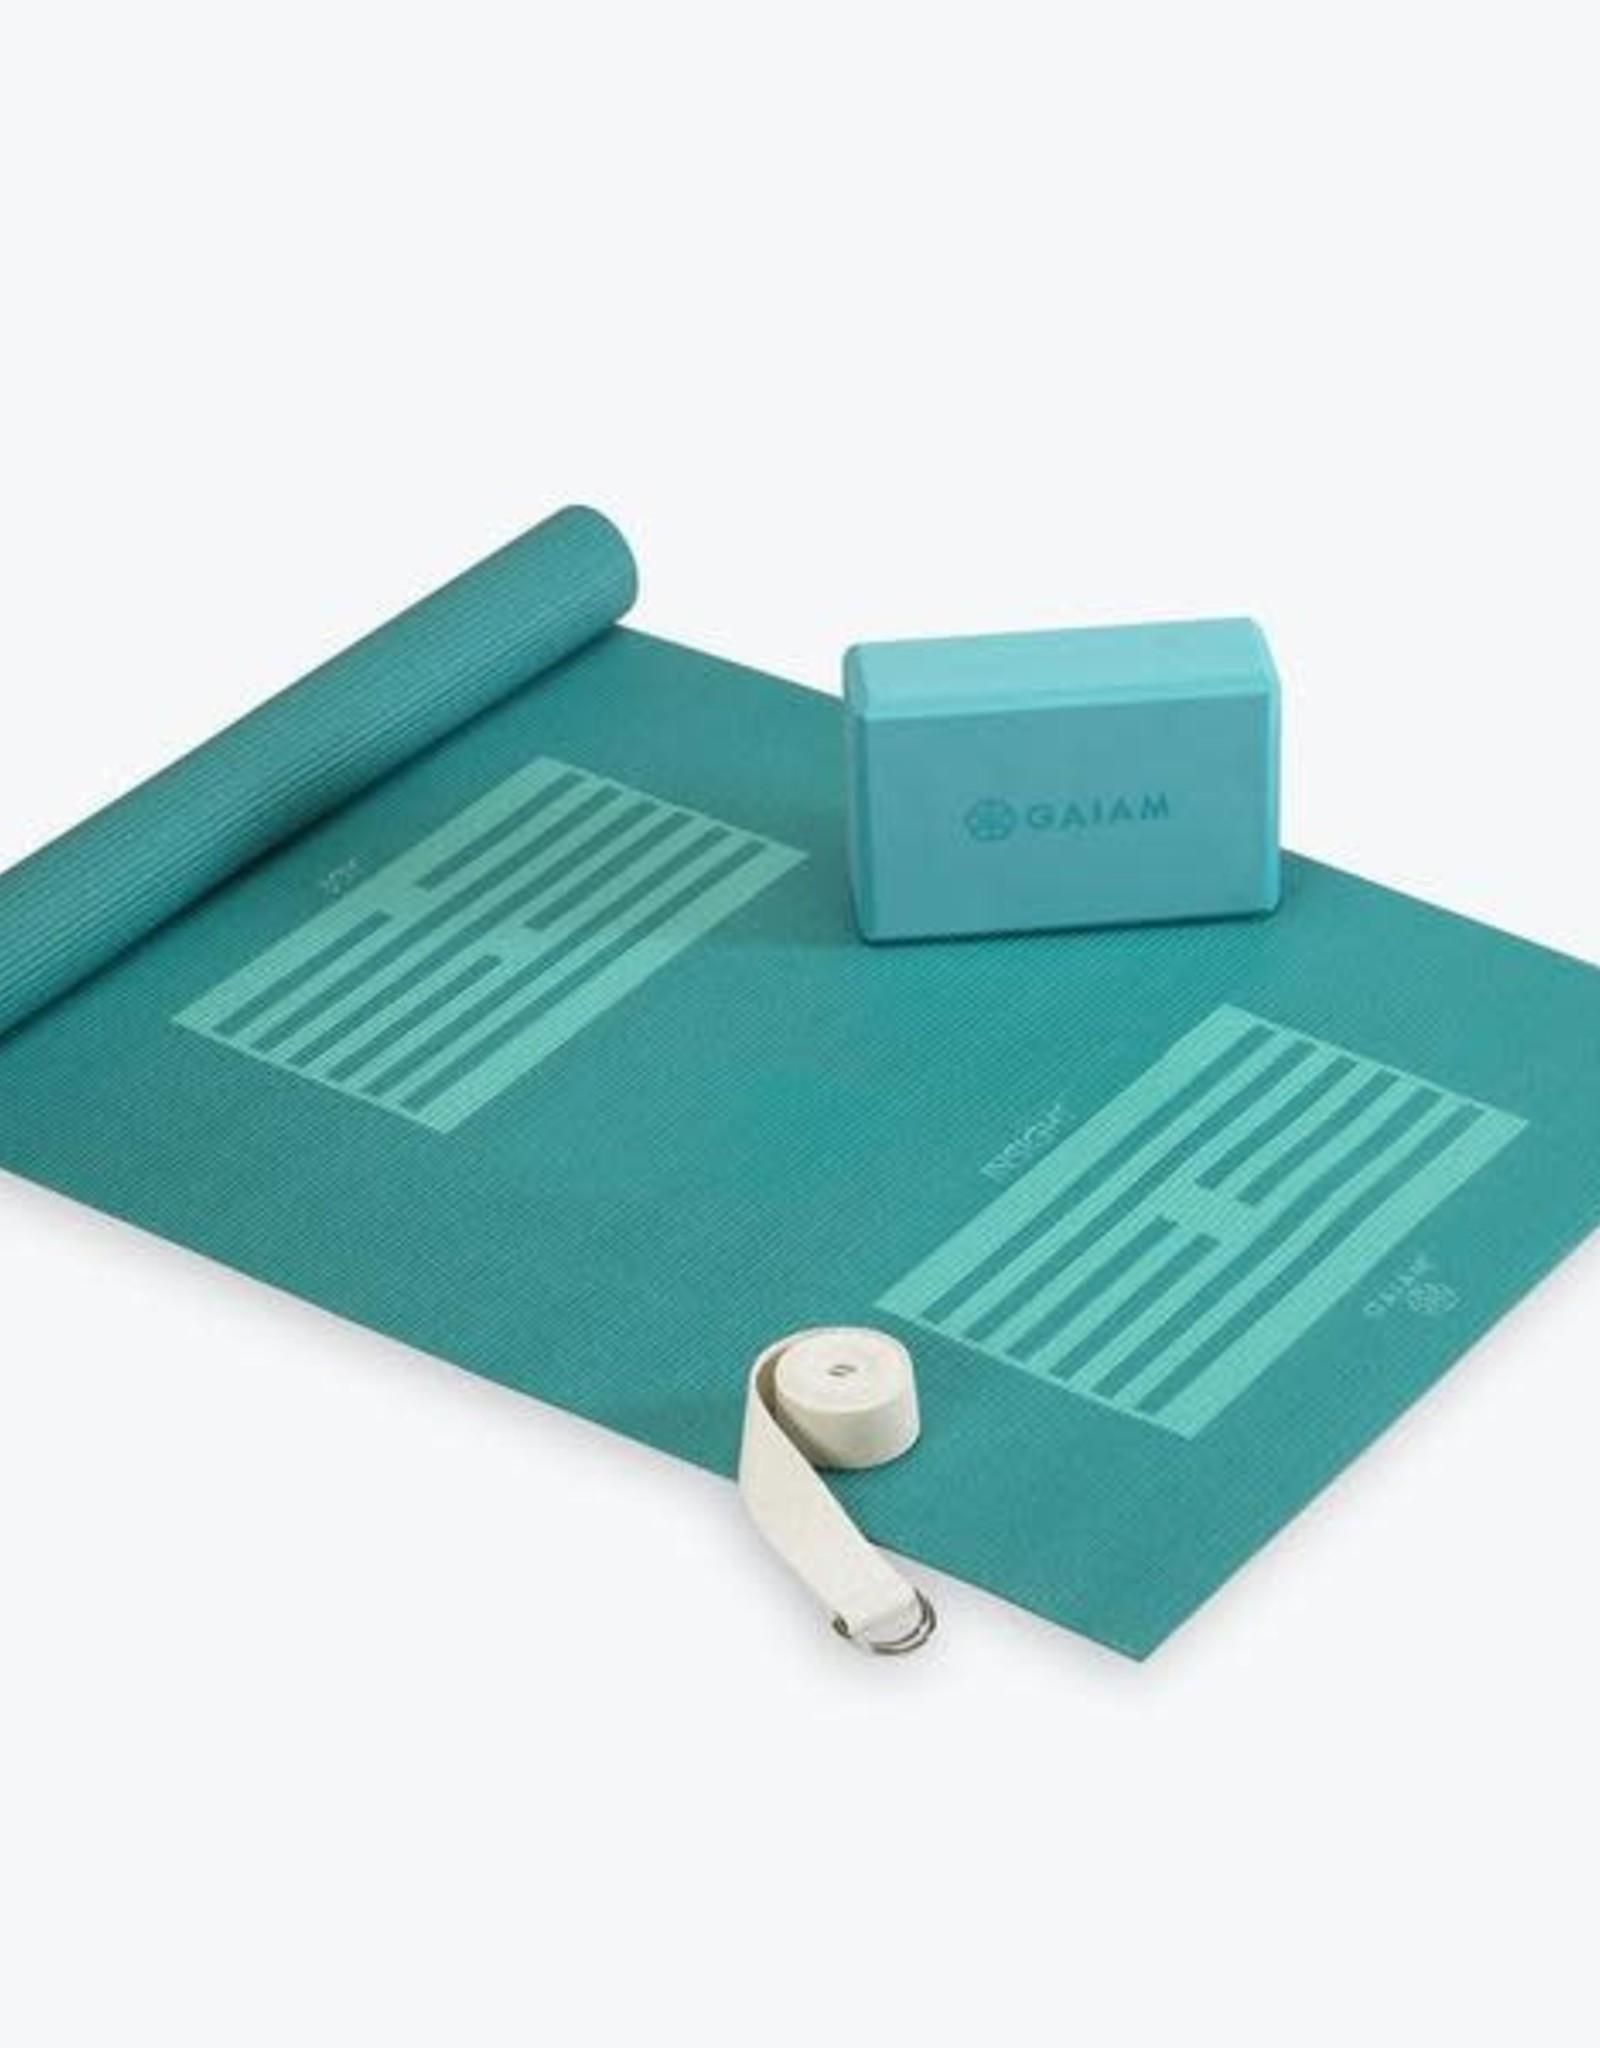 Gaiam Gaiam Yoga for Beginners Kit - blue